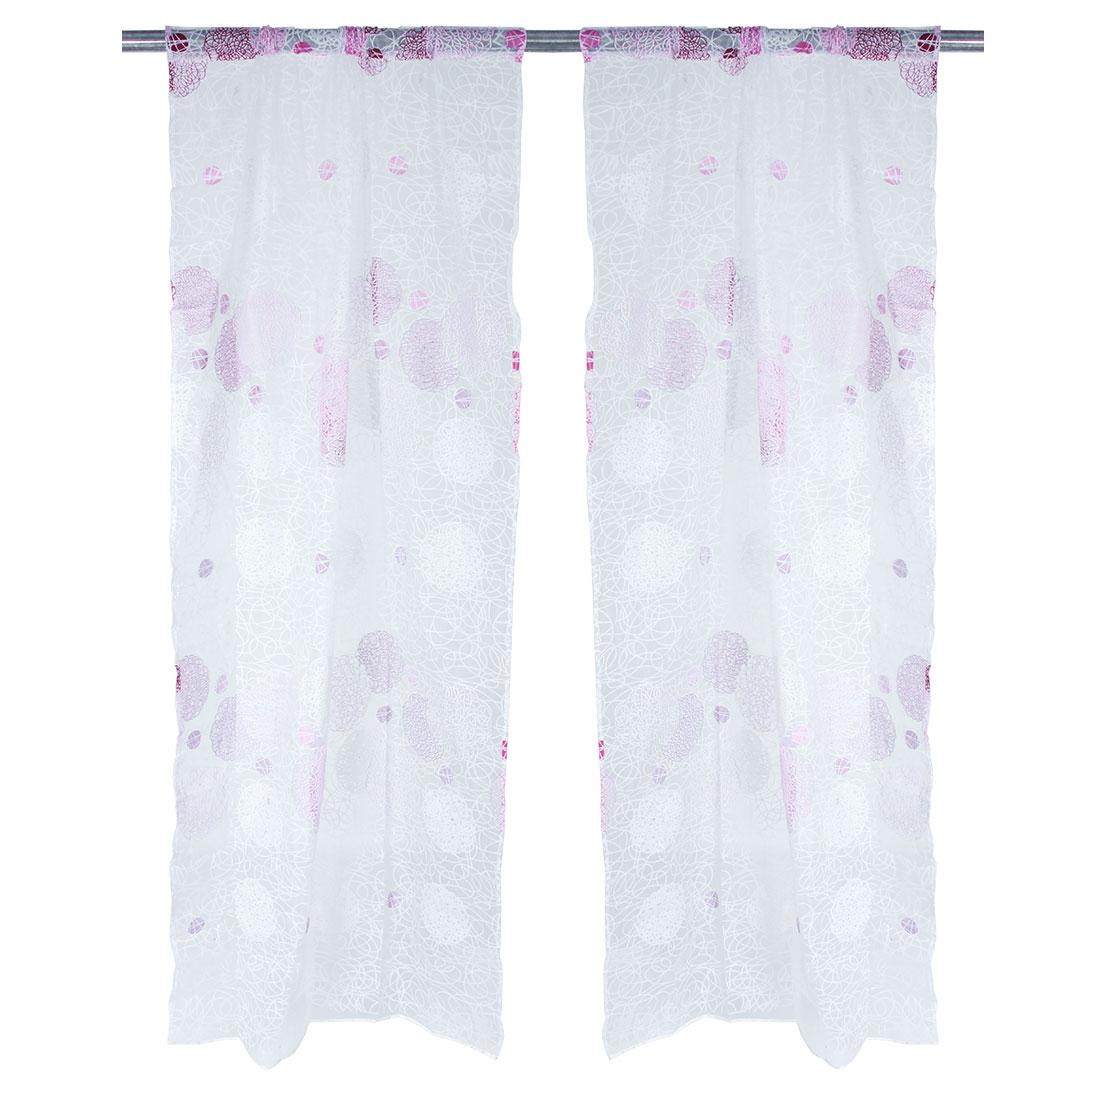 Home Spiral Pattern Decorative Panel Window Sheer Curtain Purple 100 x 200cm